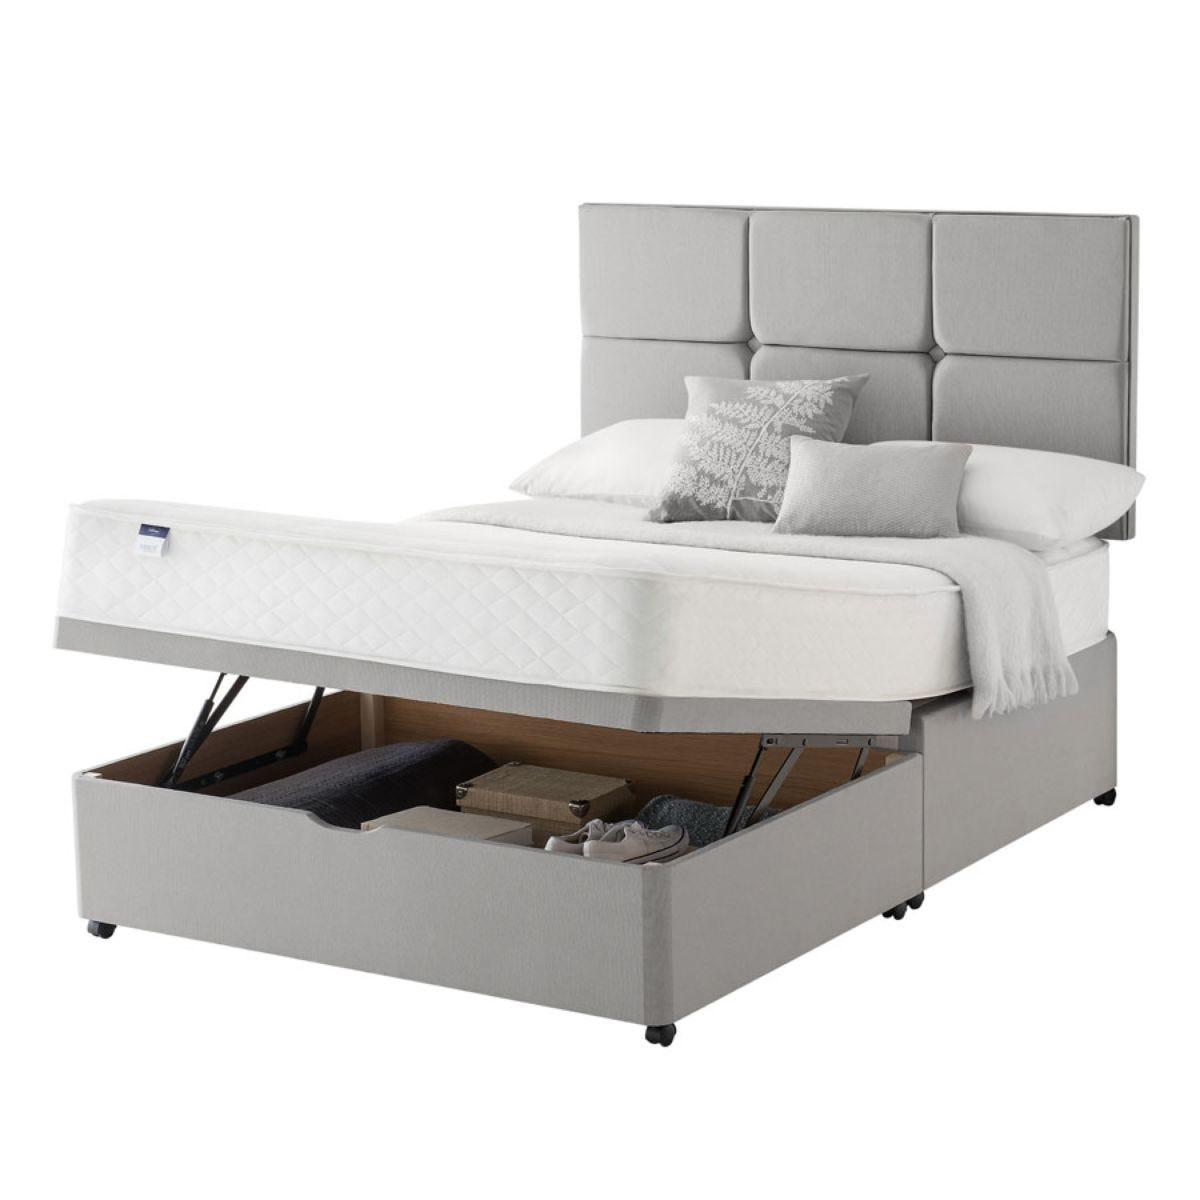 Silentnight Miracoil Memory Ottoman Divan Bed - Grey